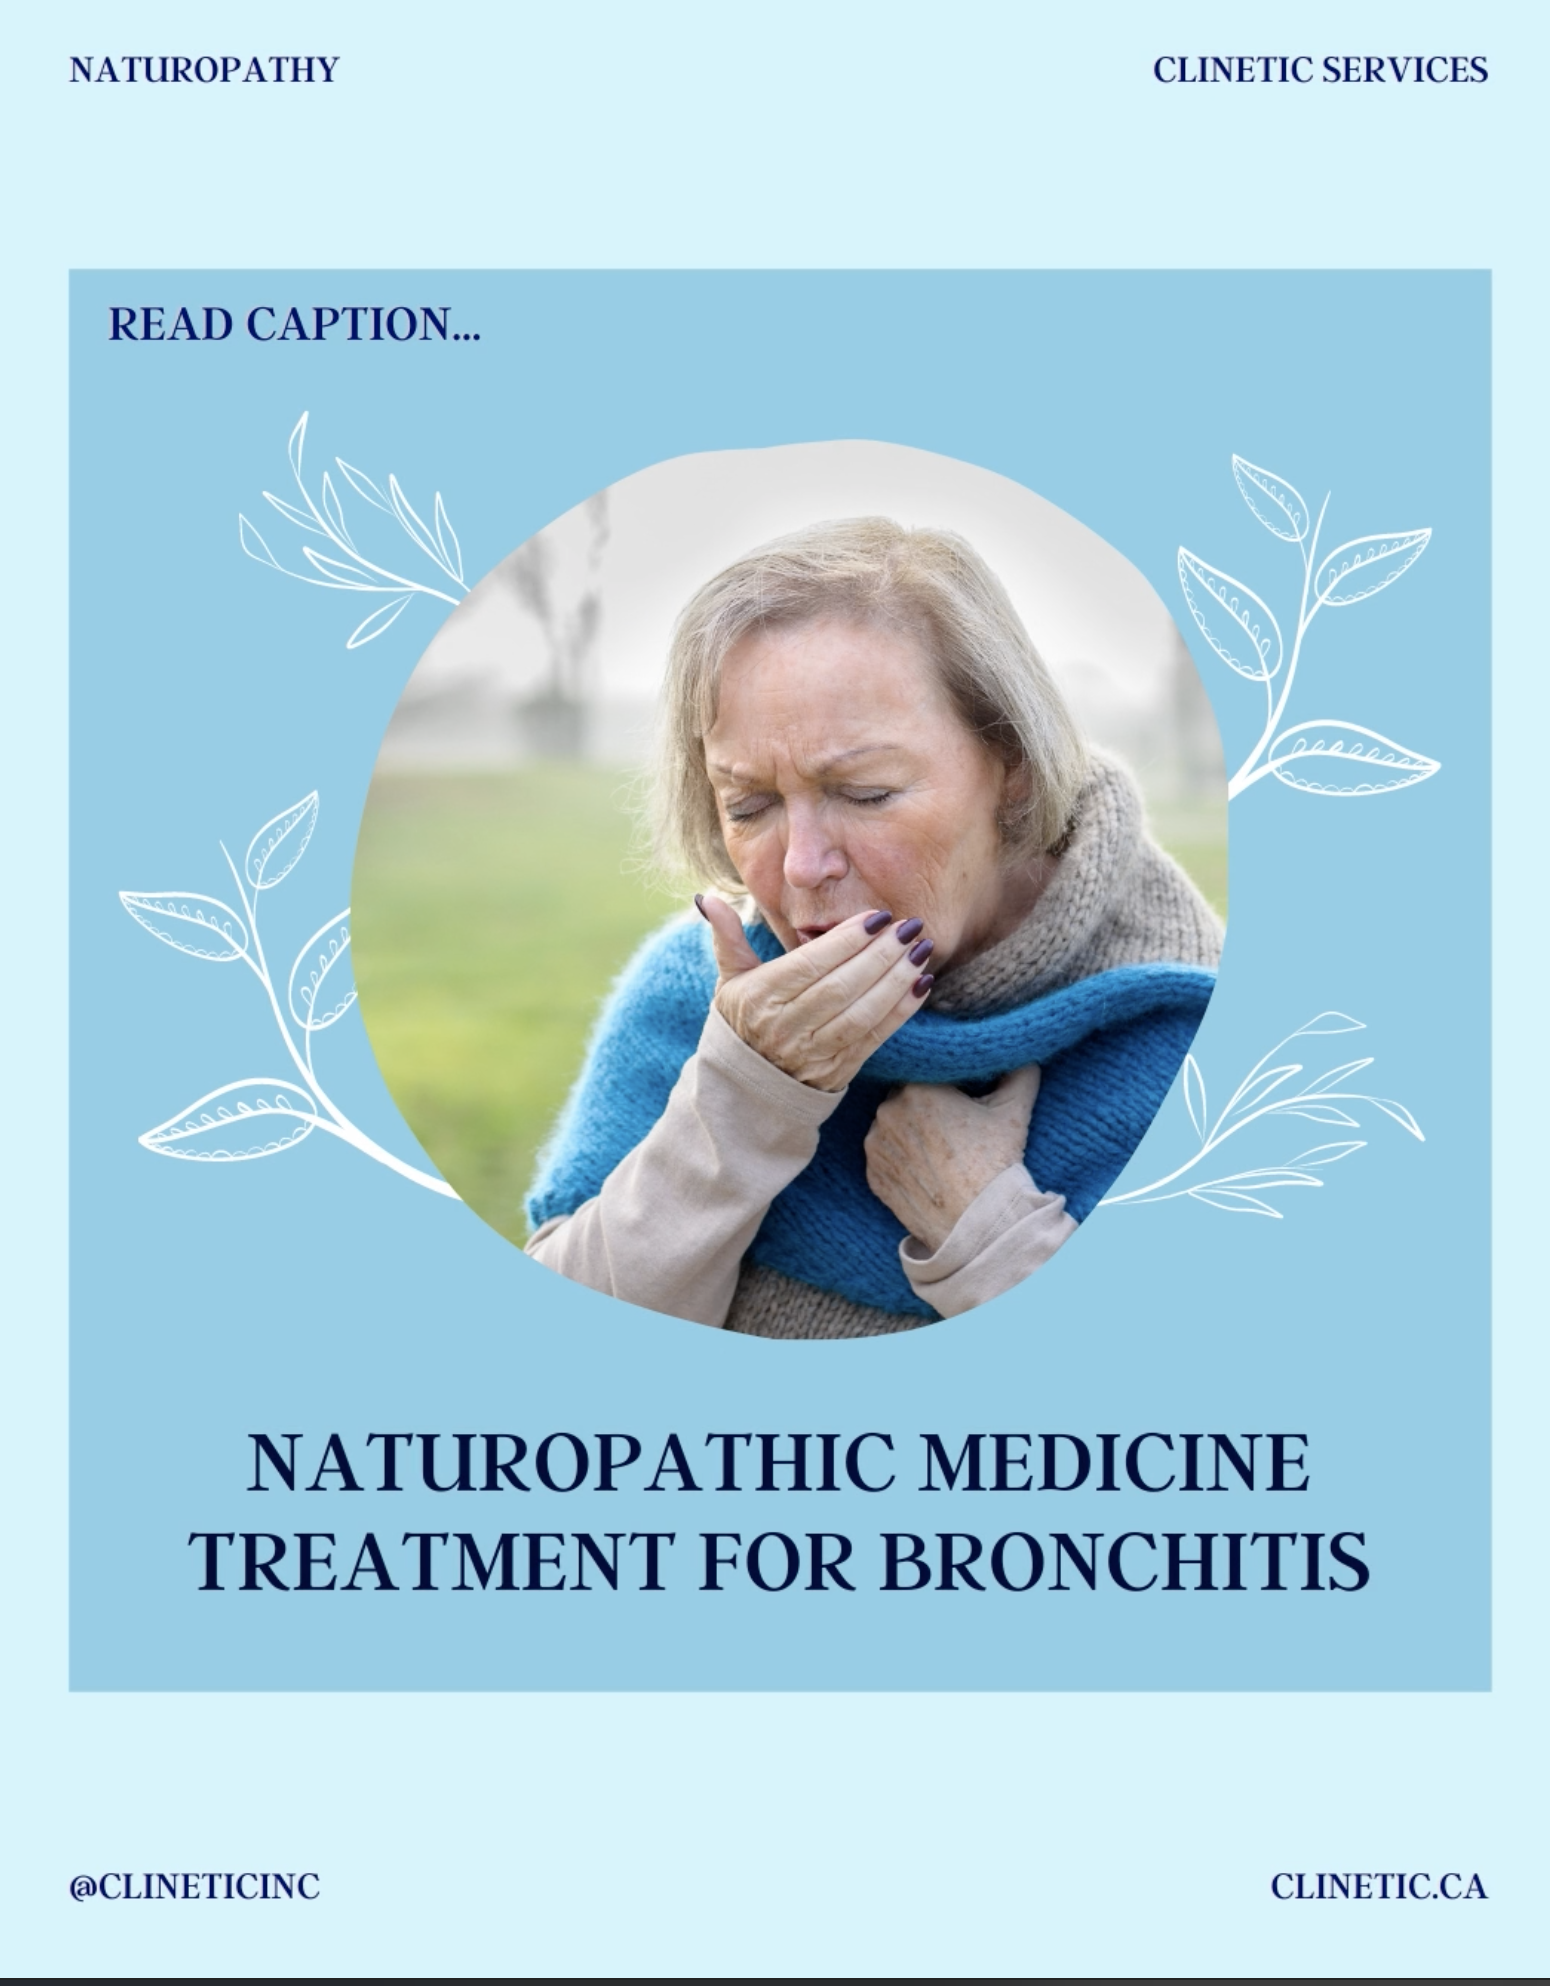 Naturopathic medicine treatment for Bronchitis